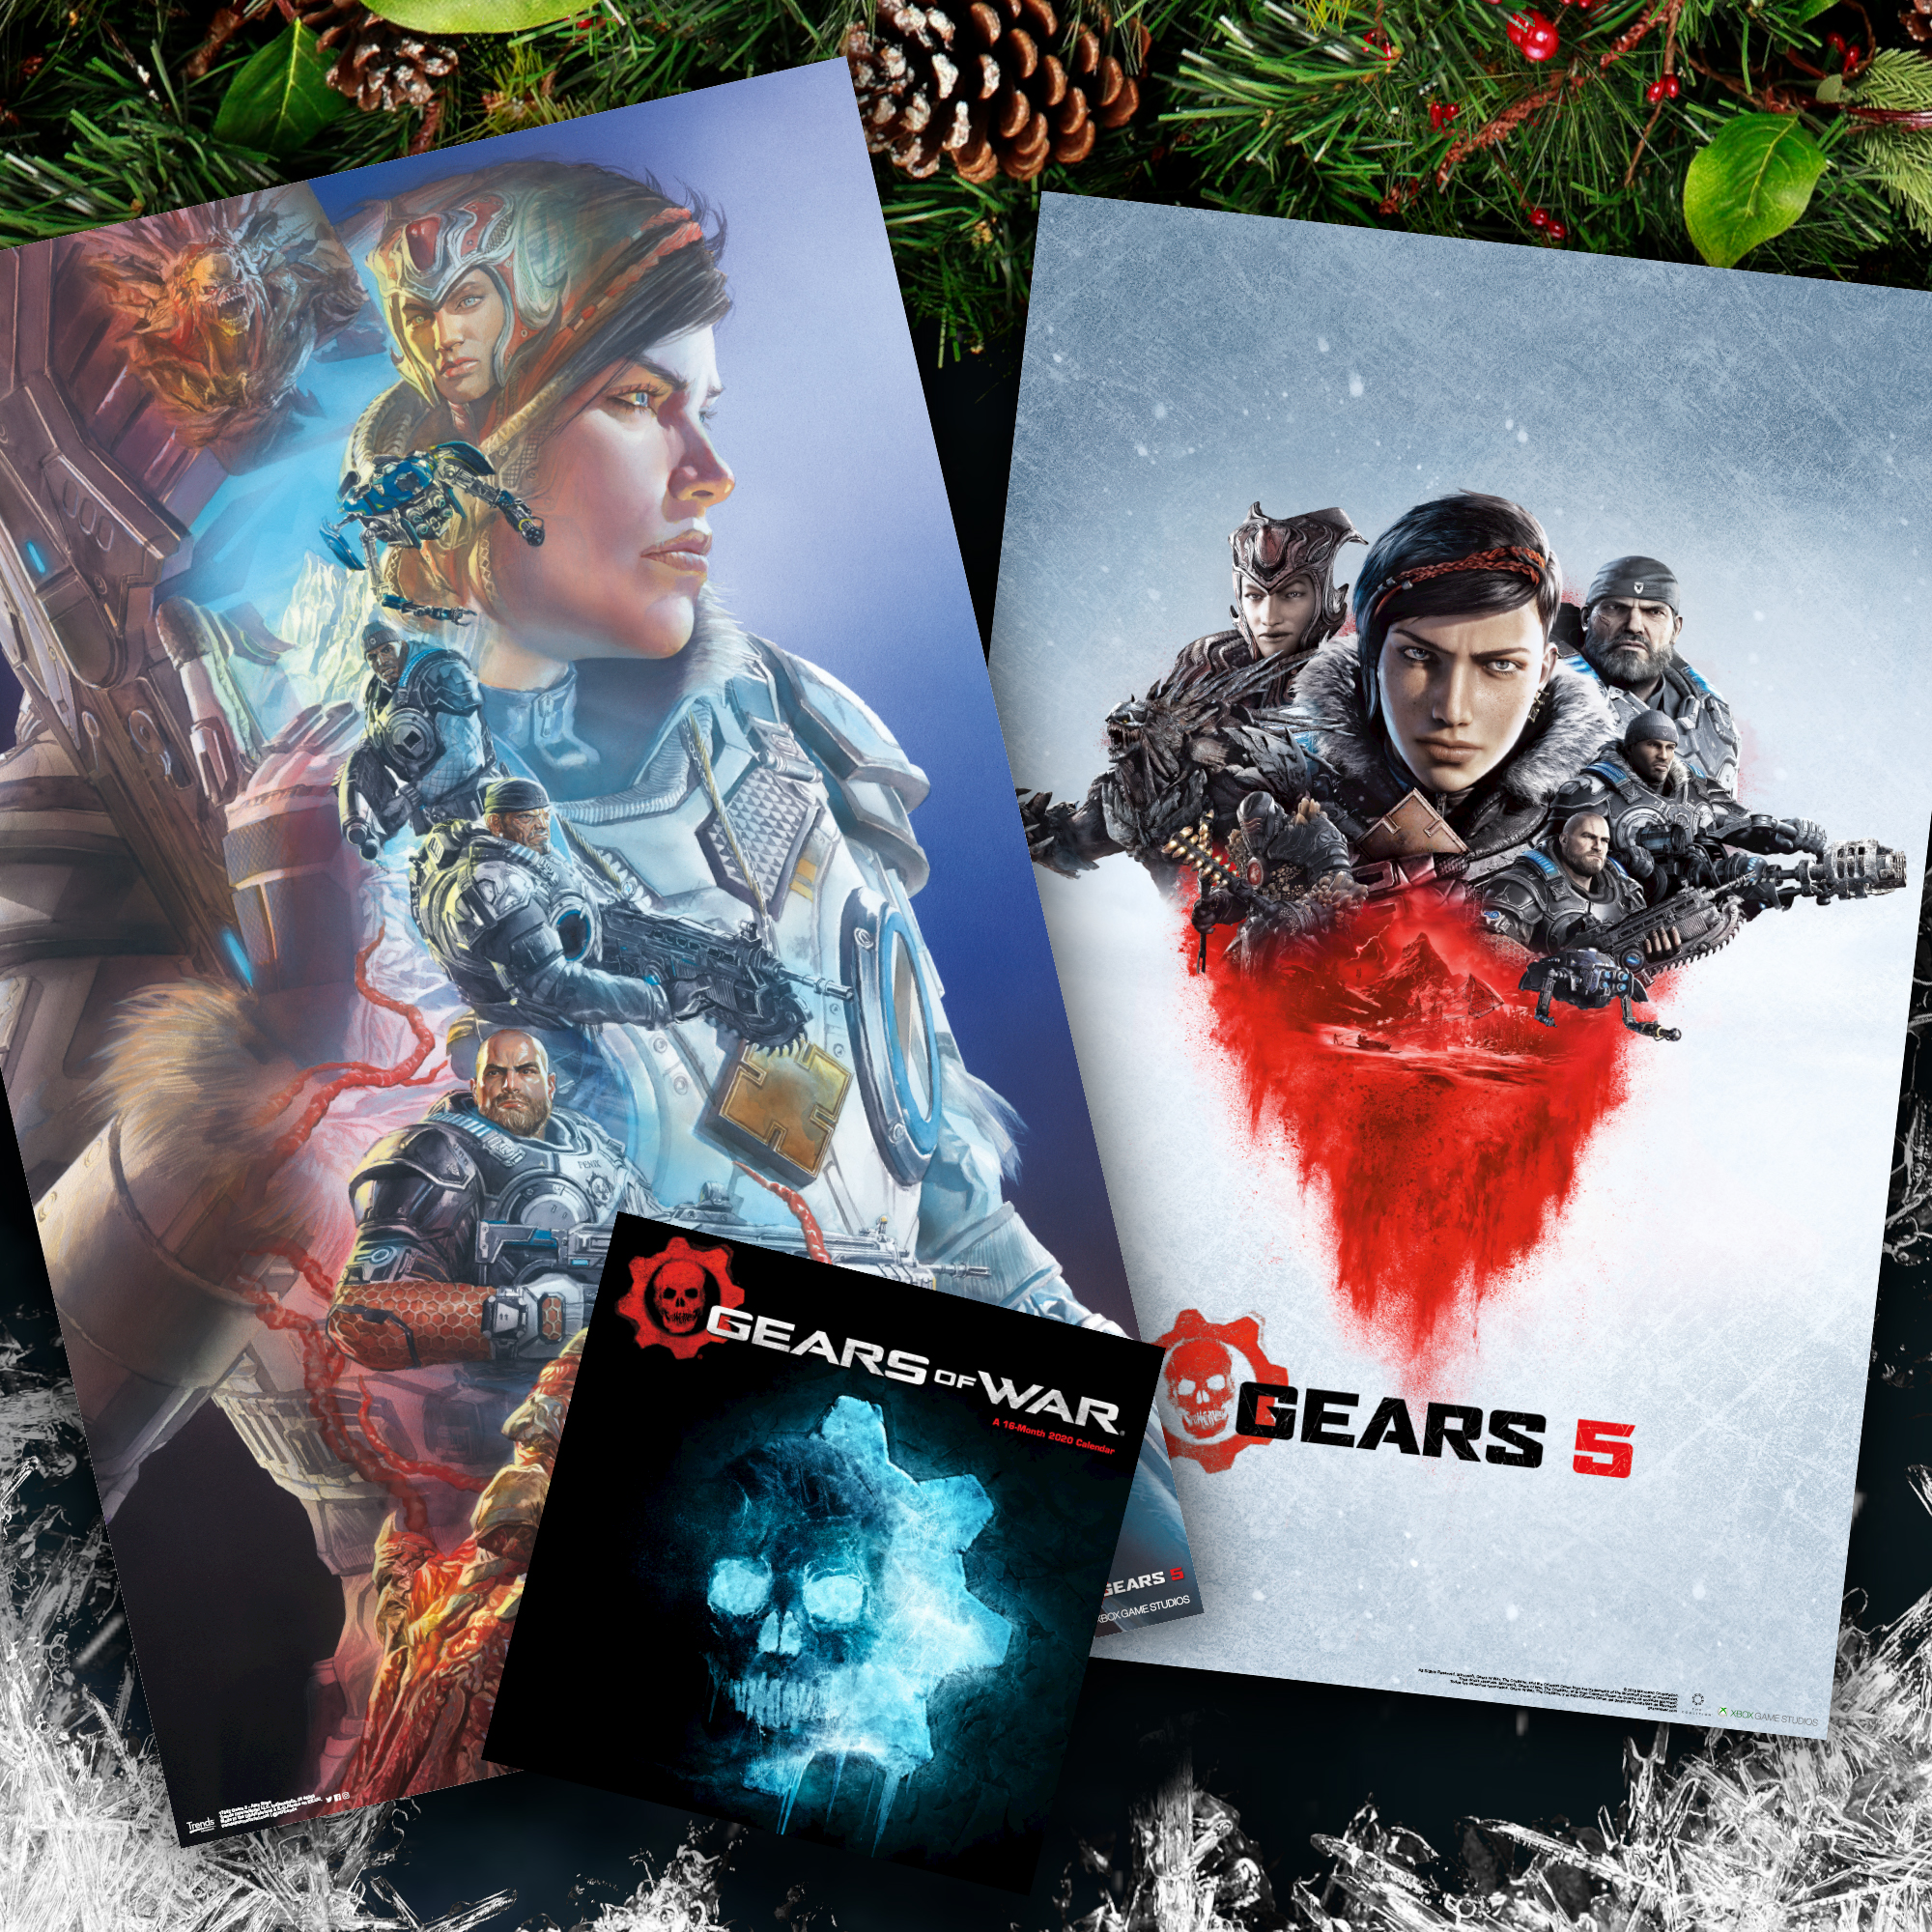 Gears 5 themed home decor items